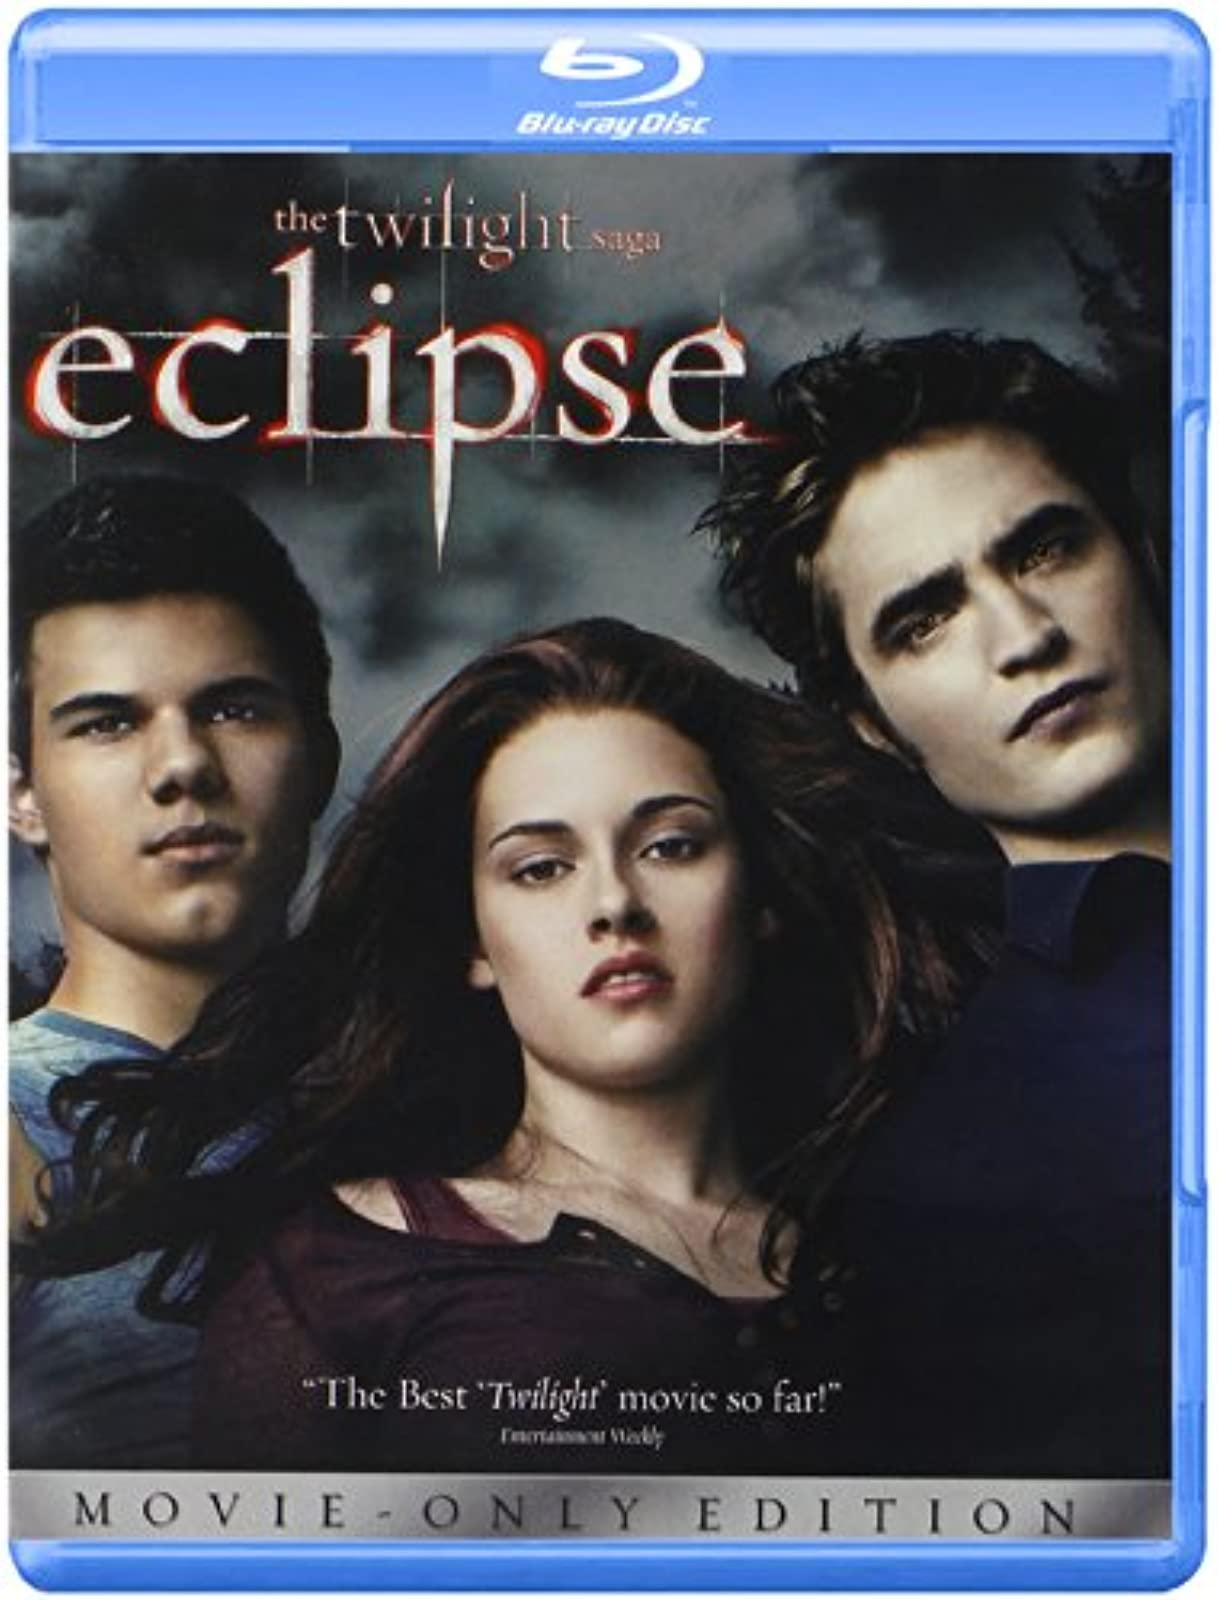 The Twilight Saga: Eclipse Blu-Ray On Blu-Ray With Kristen Stewart